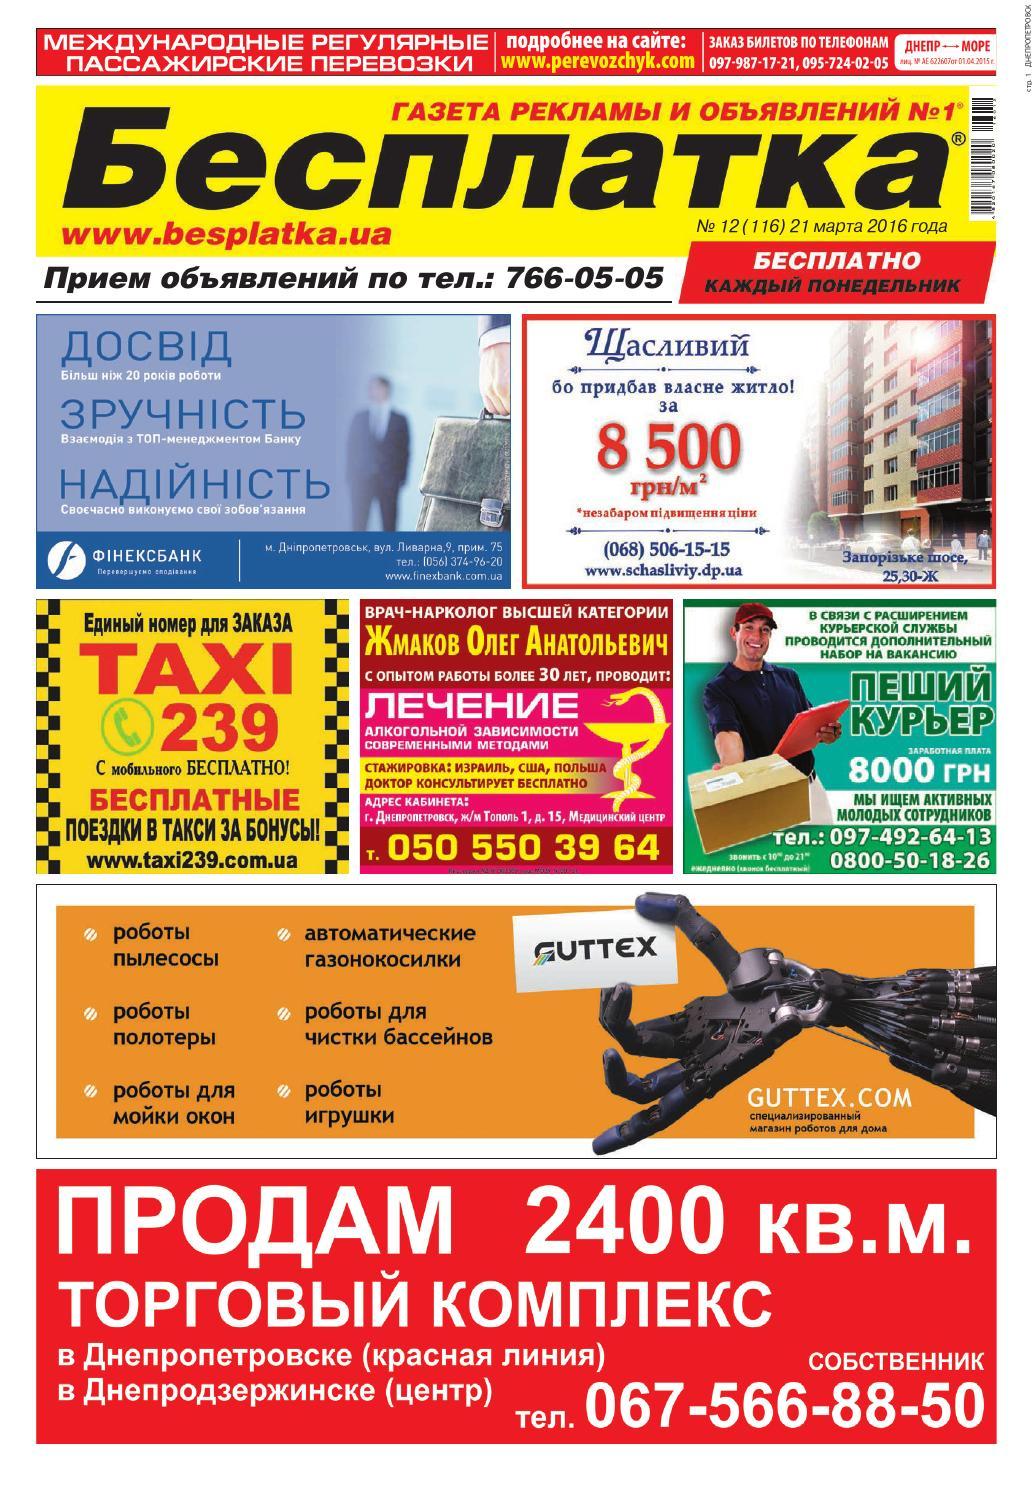 Besplatka  12 Днепропетровск by besplatka ukraine - issuu aa2b49832b790